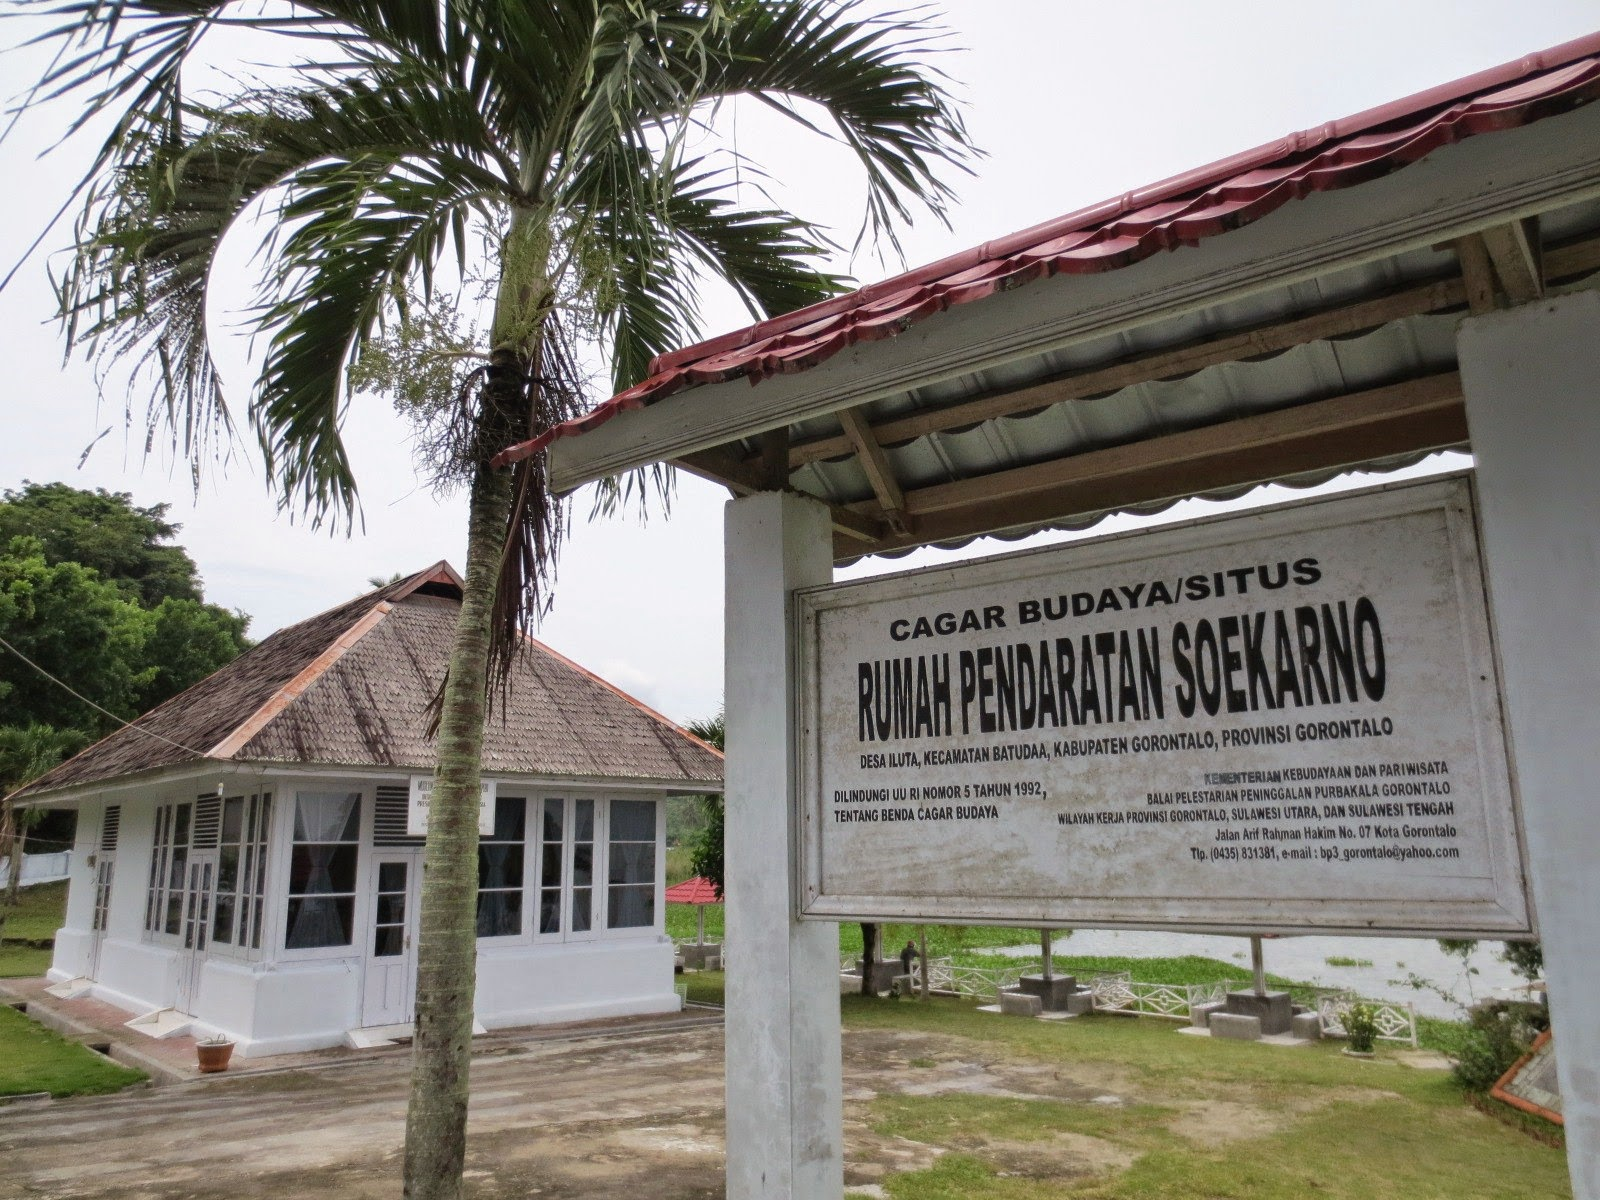 Gorontalo Tour Pendaratan Soekarno Wisata Rumah Adat Kab